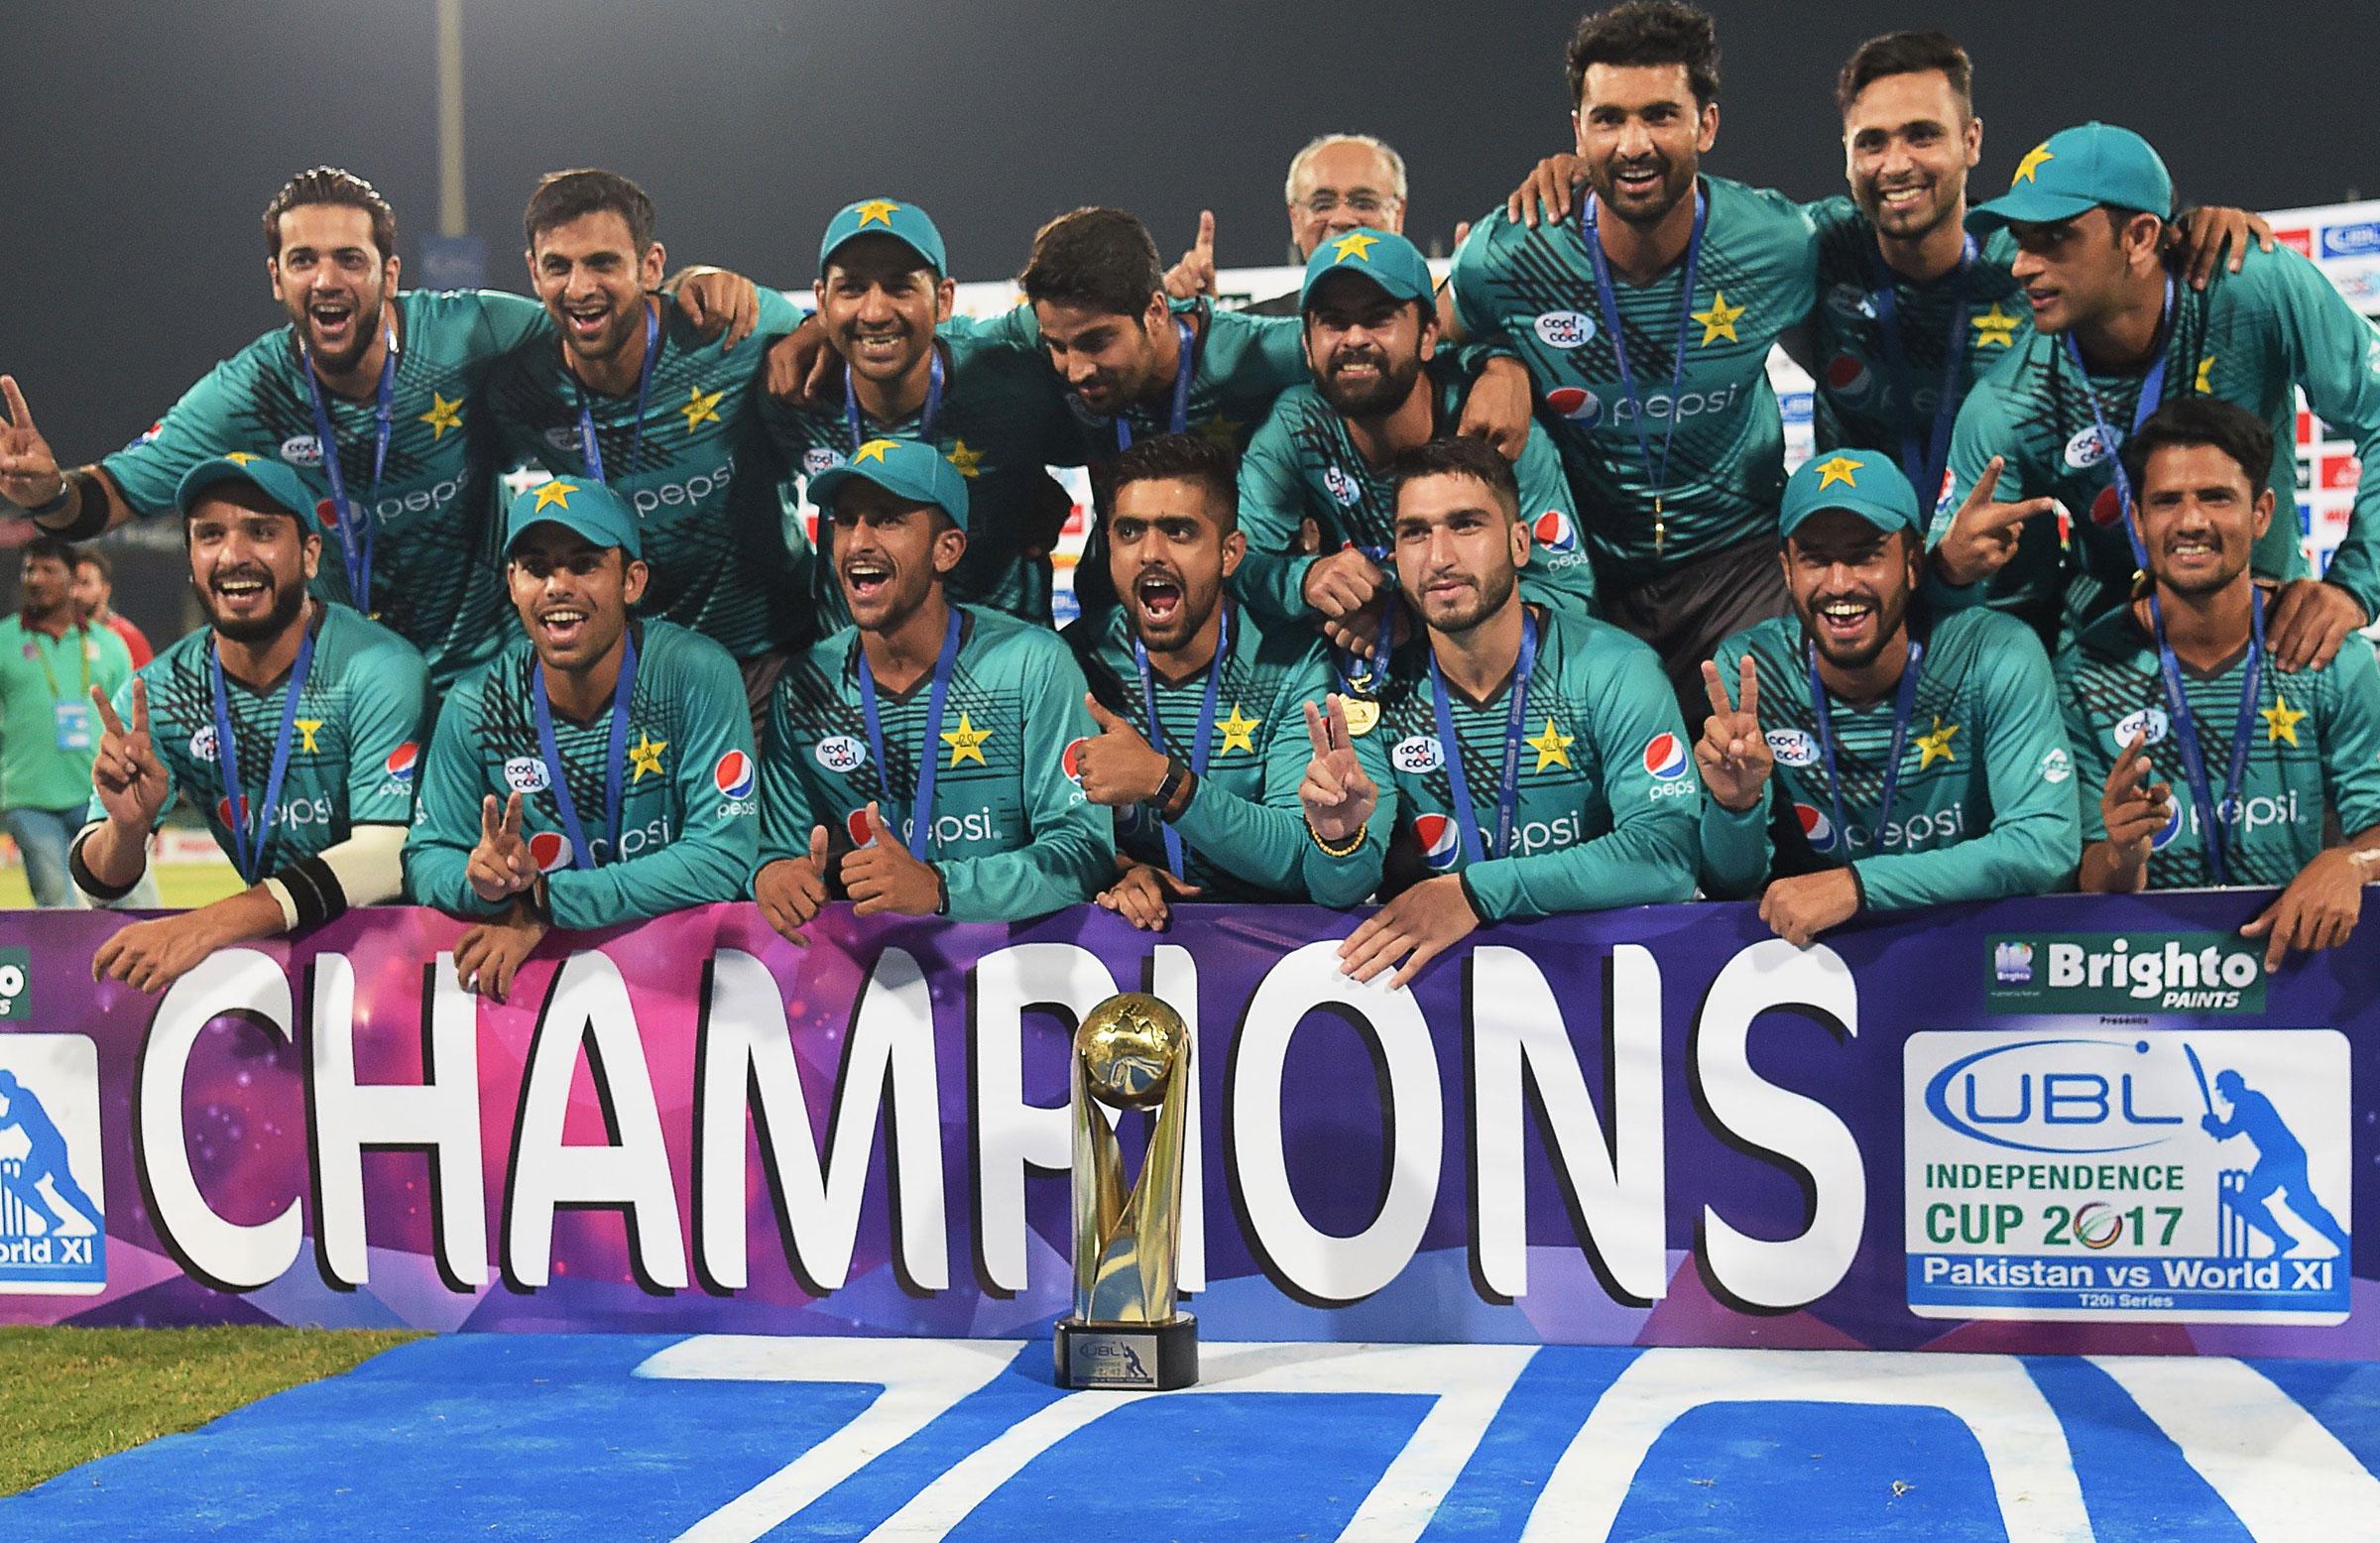 Pakistan won the series 2-1 // Getty